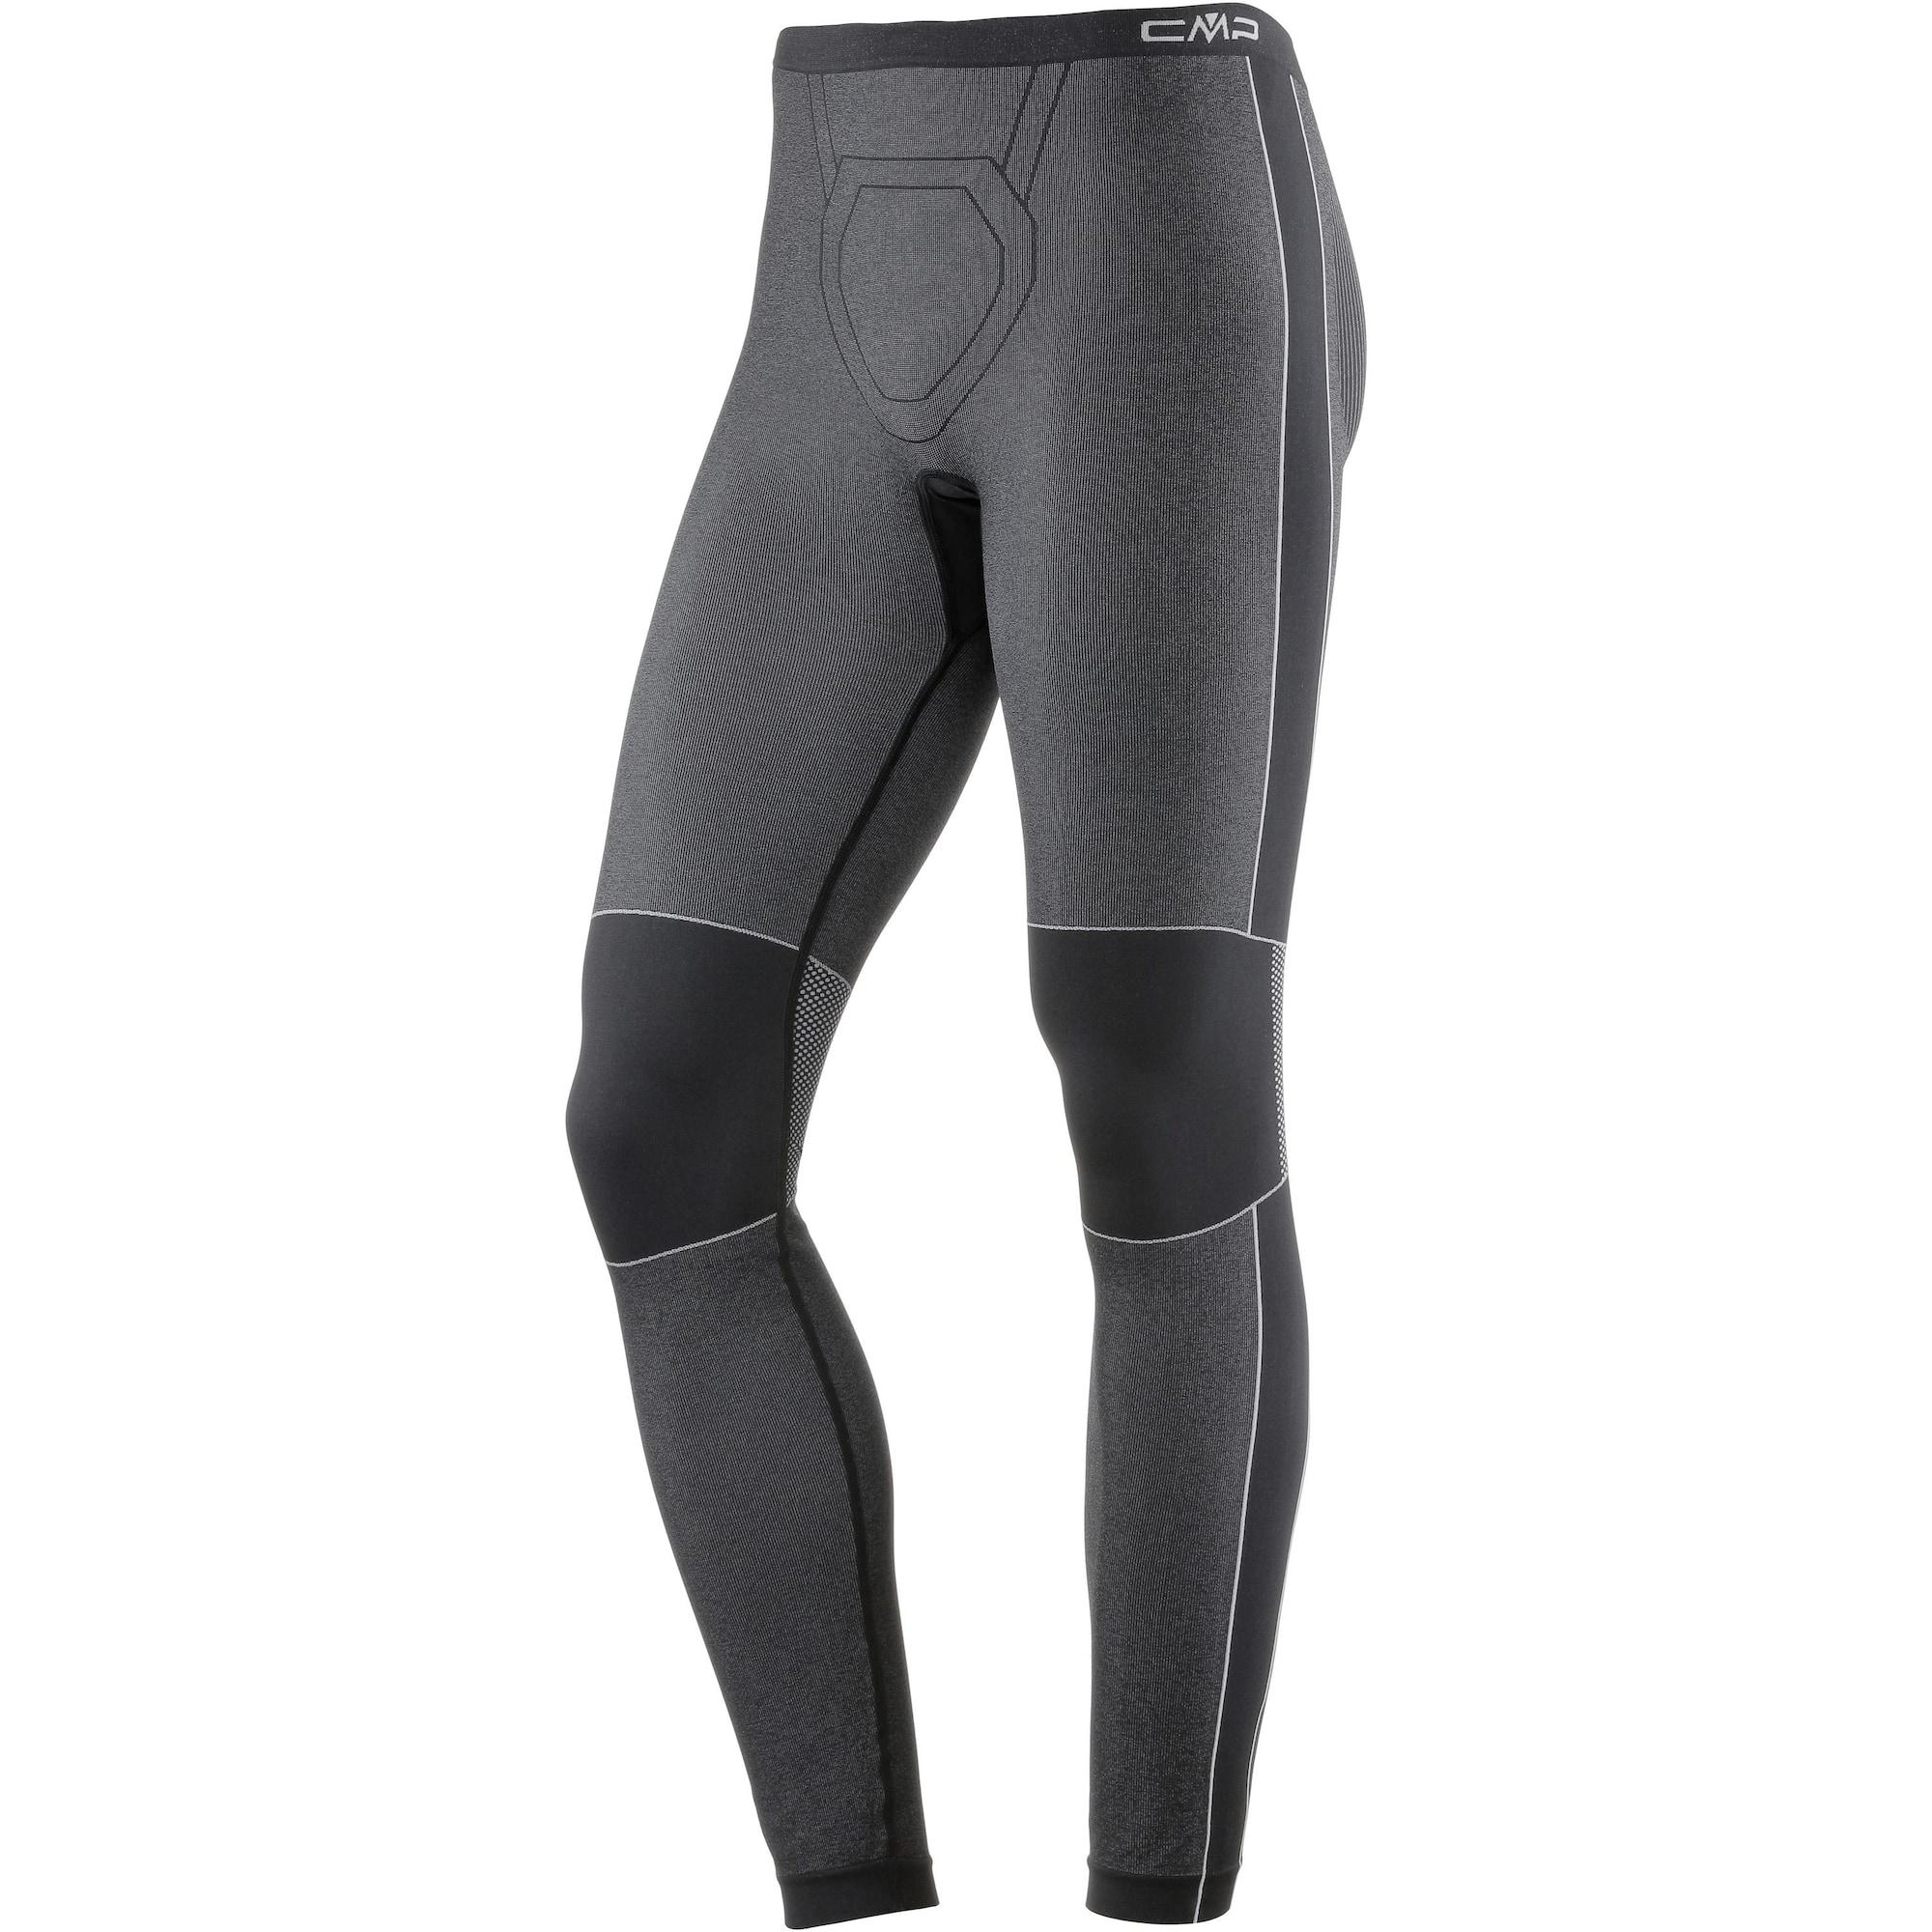 Funktionsunterhose Herren | Sportbekleidung > Funktionswäsche > Thermoleggings | Grau | CMP